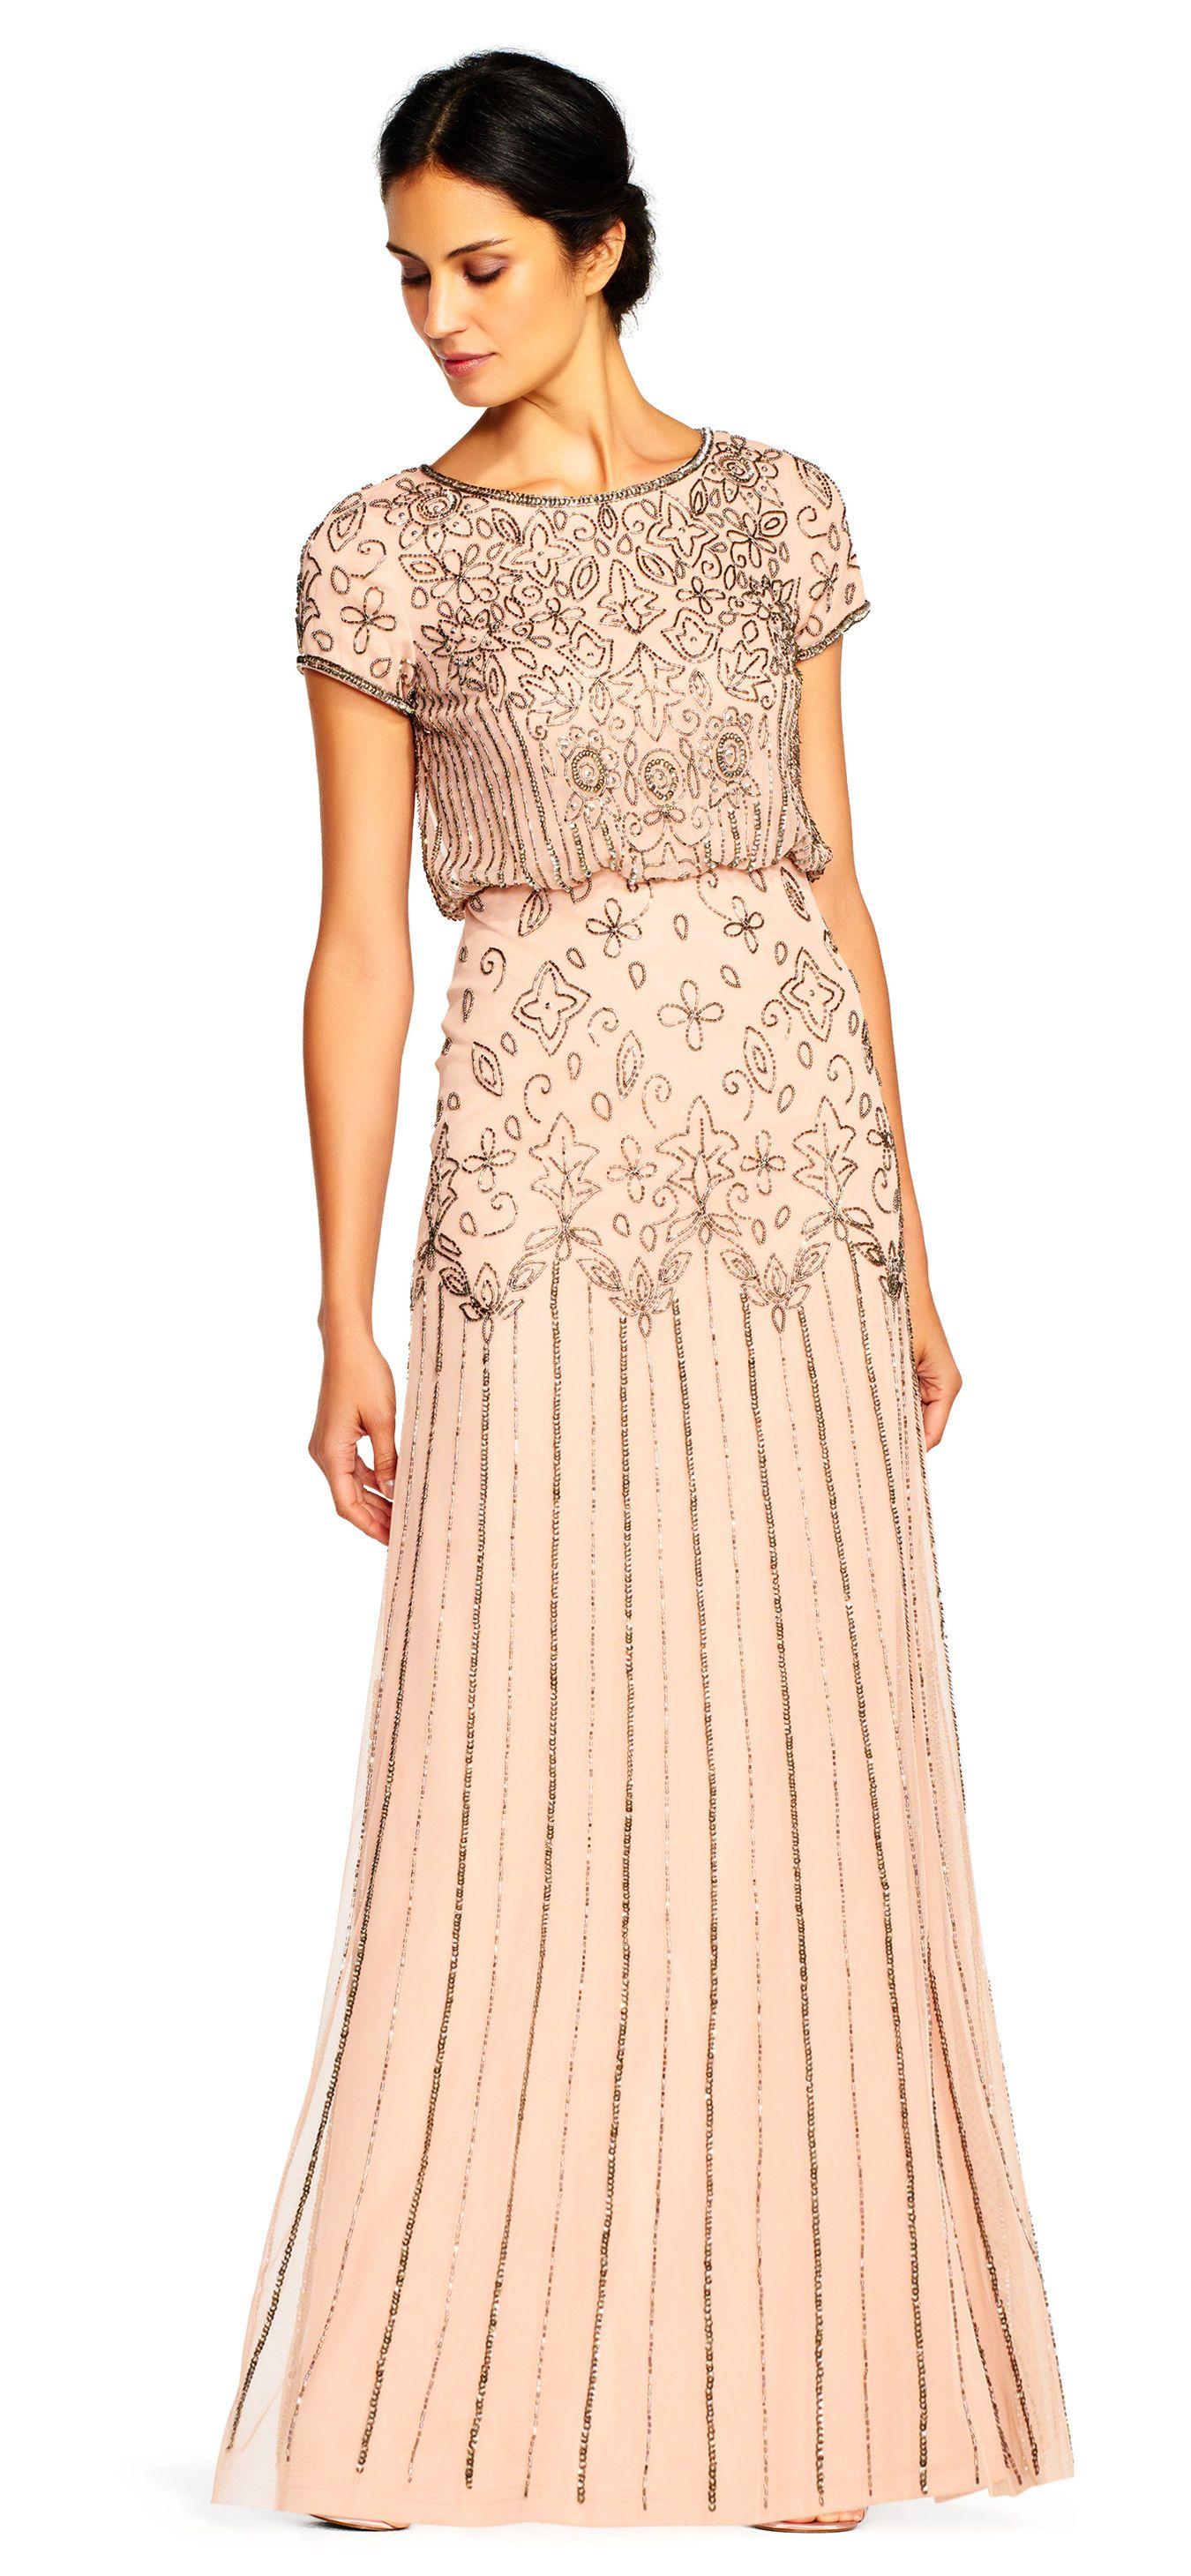 Adrianna Papell   Short Sleeve Blouson Beaded Gown   Dreamy dream ...